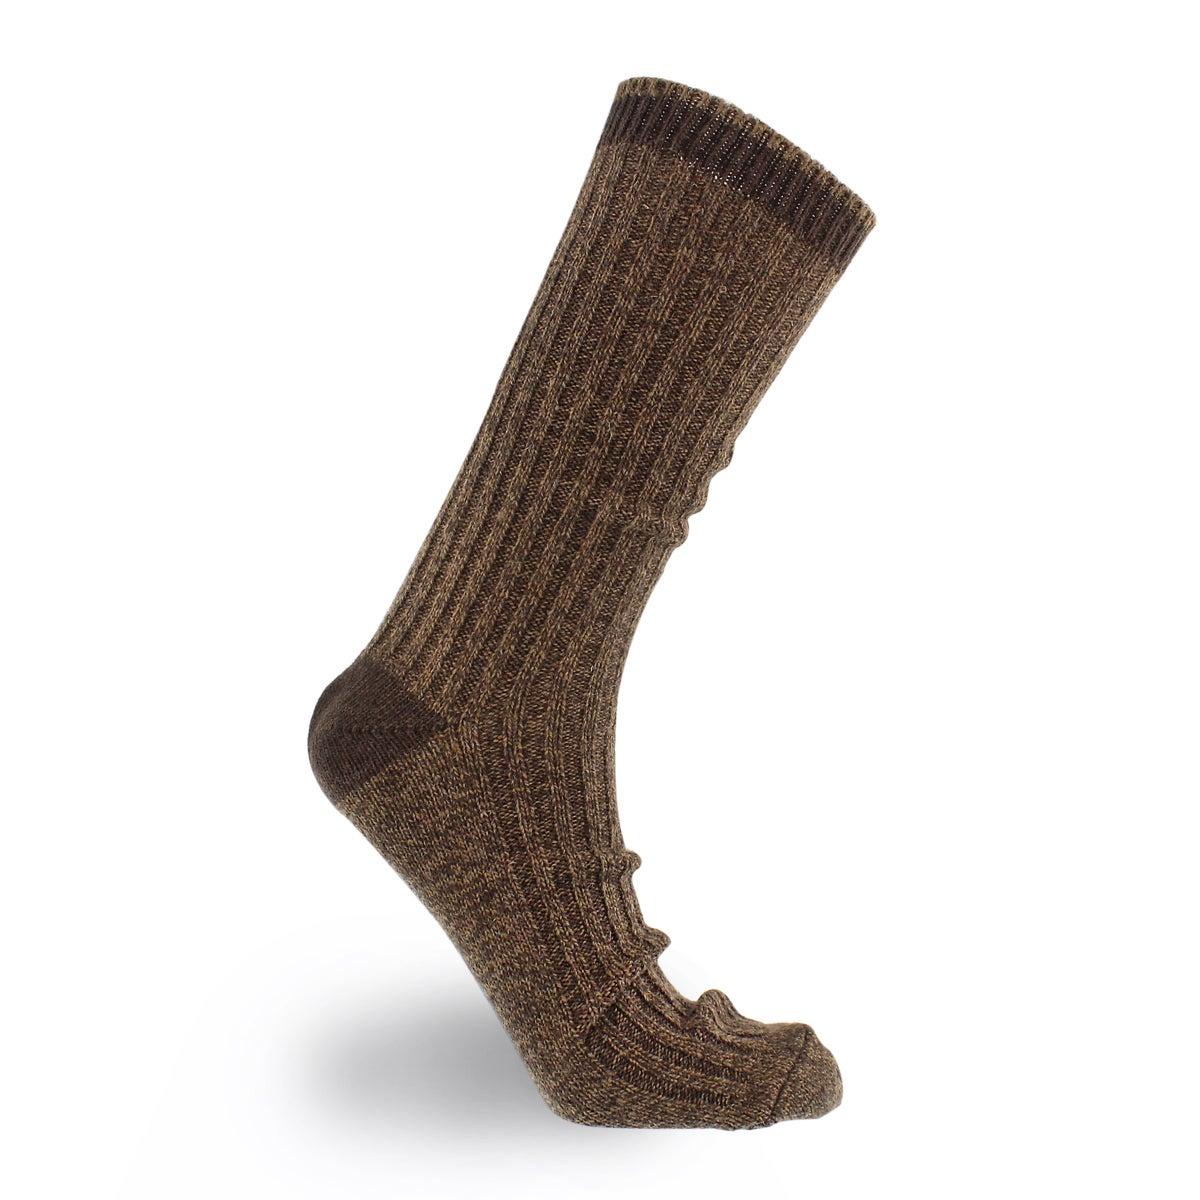 Mns 84N Basic Rib Crew cordovan sock